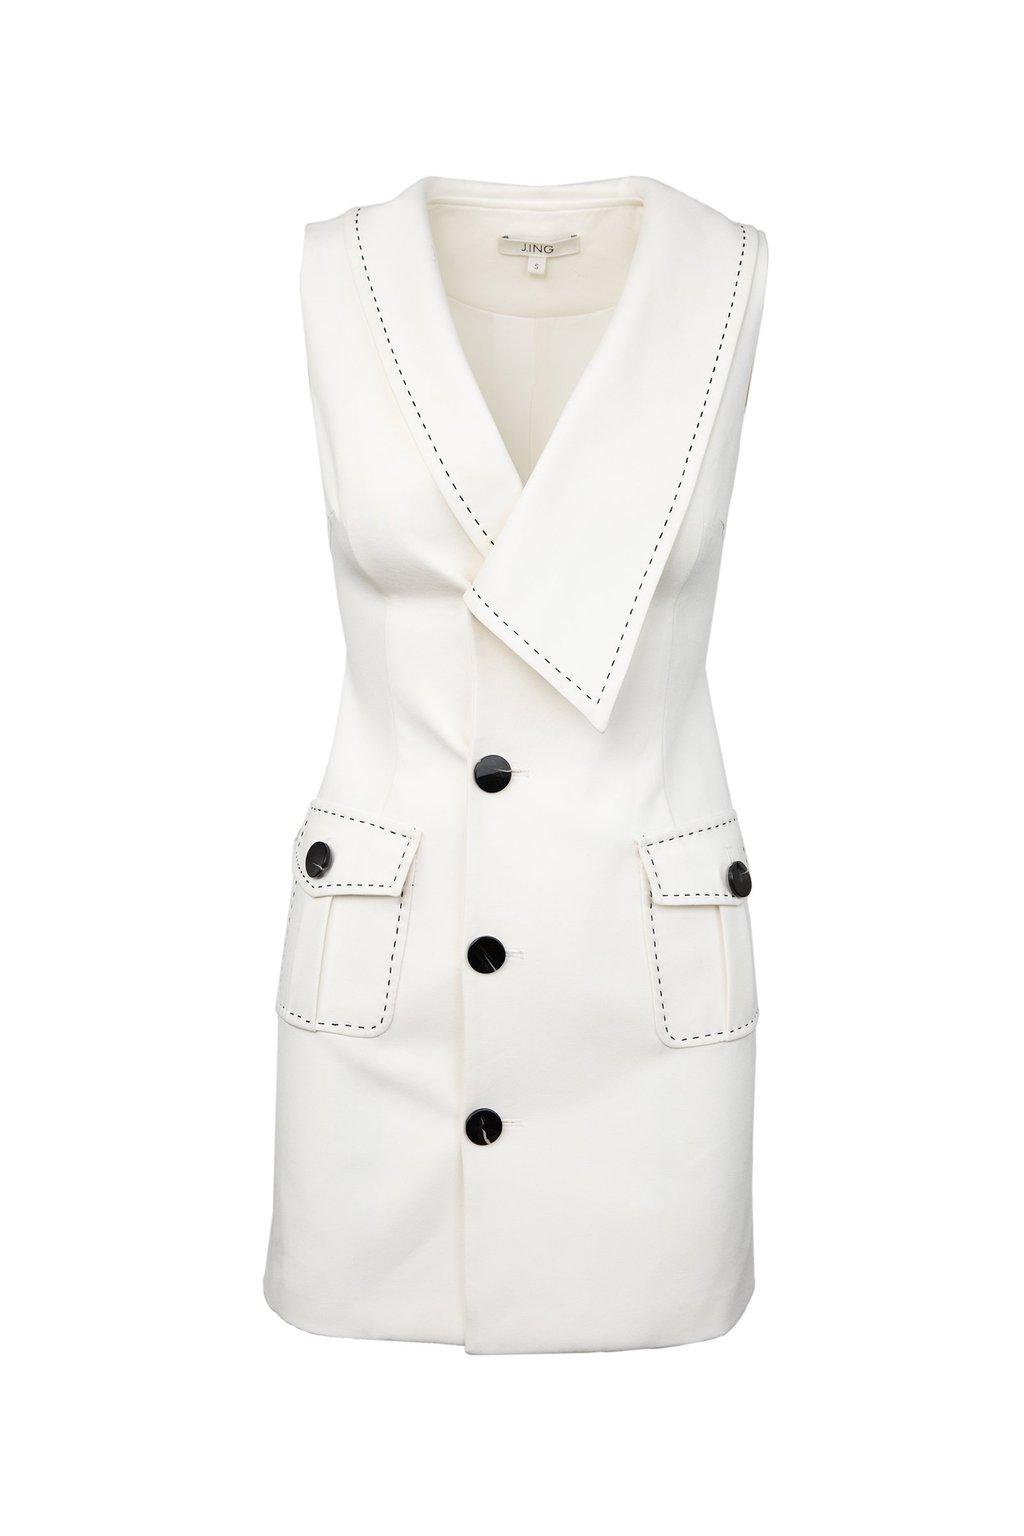 White Sailor Dress by J.ING women's clothing